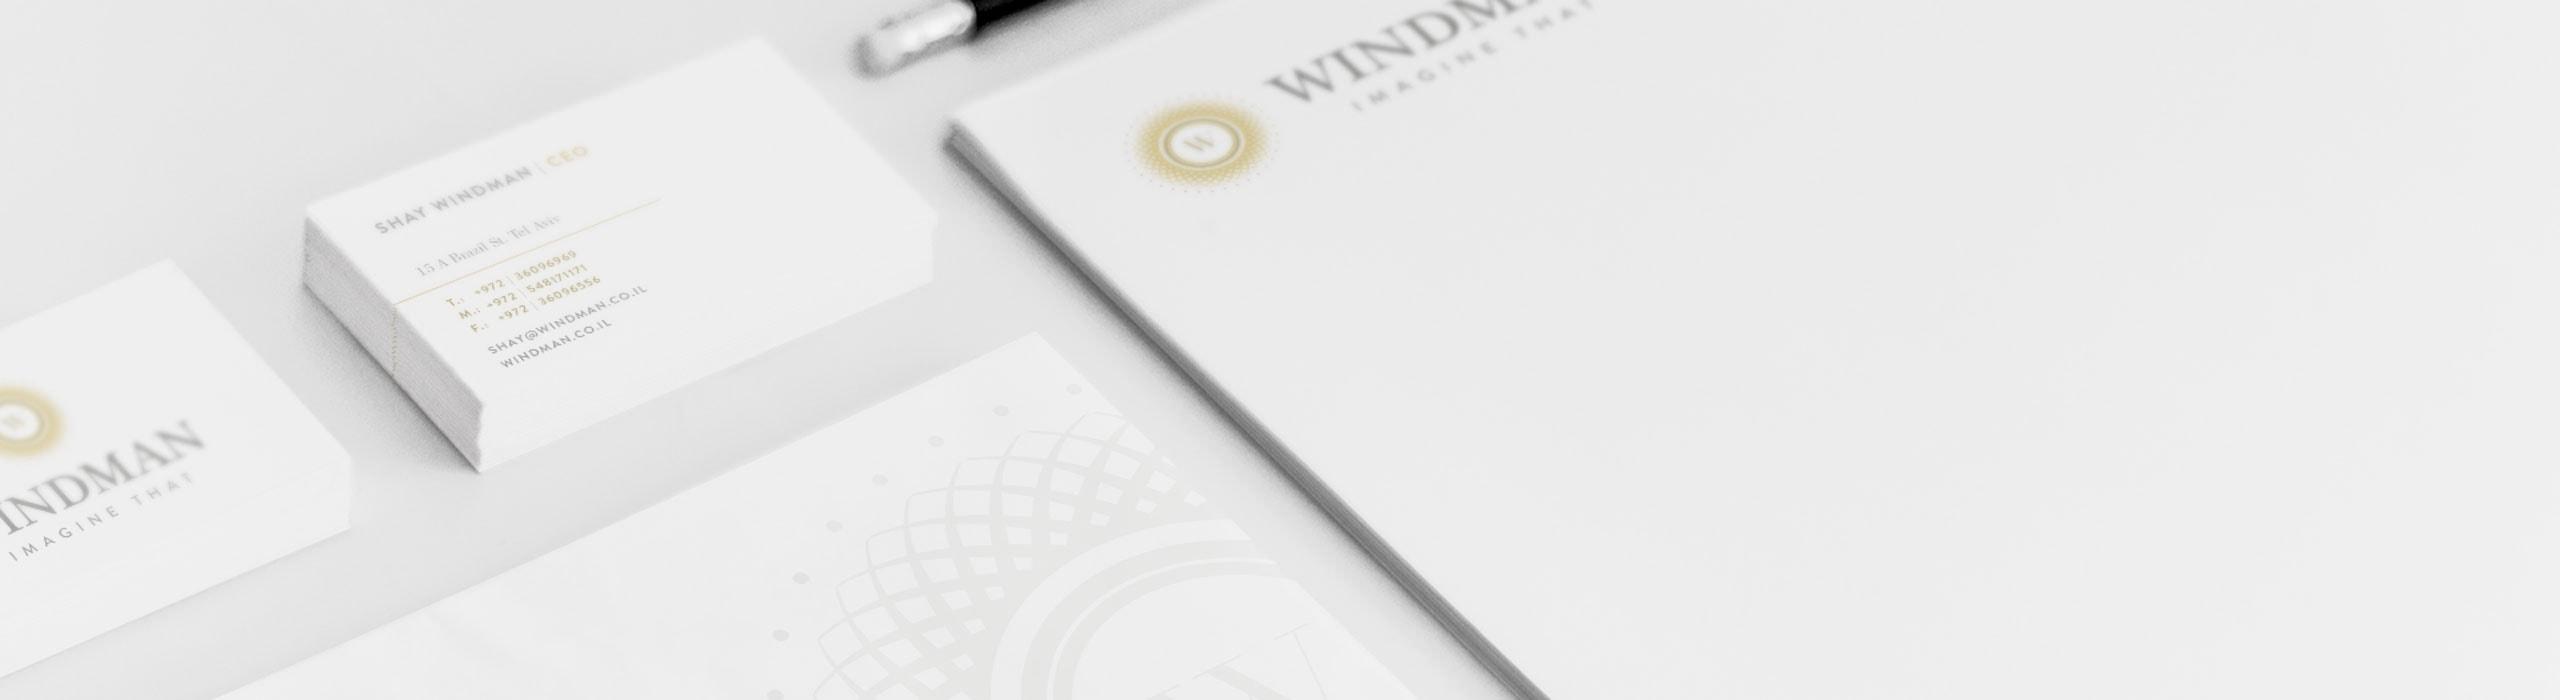 Windman - natie-windman-stationary-design - Natie Branding Agency